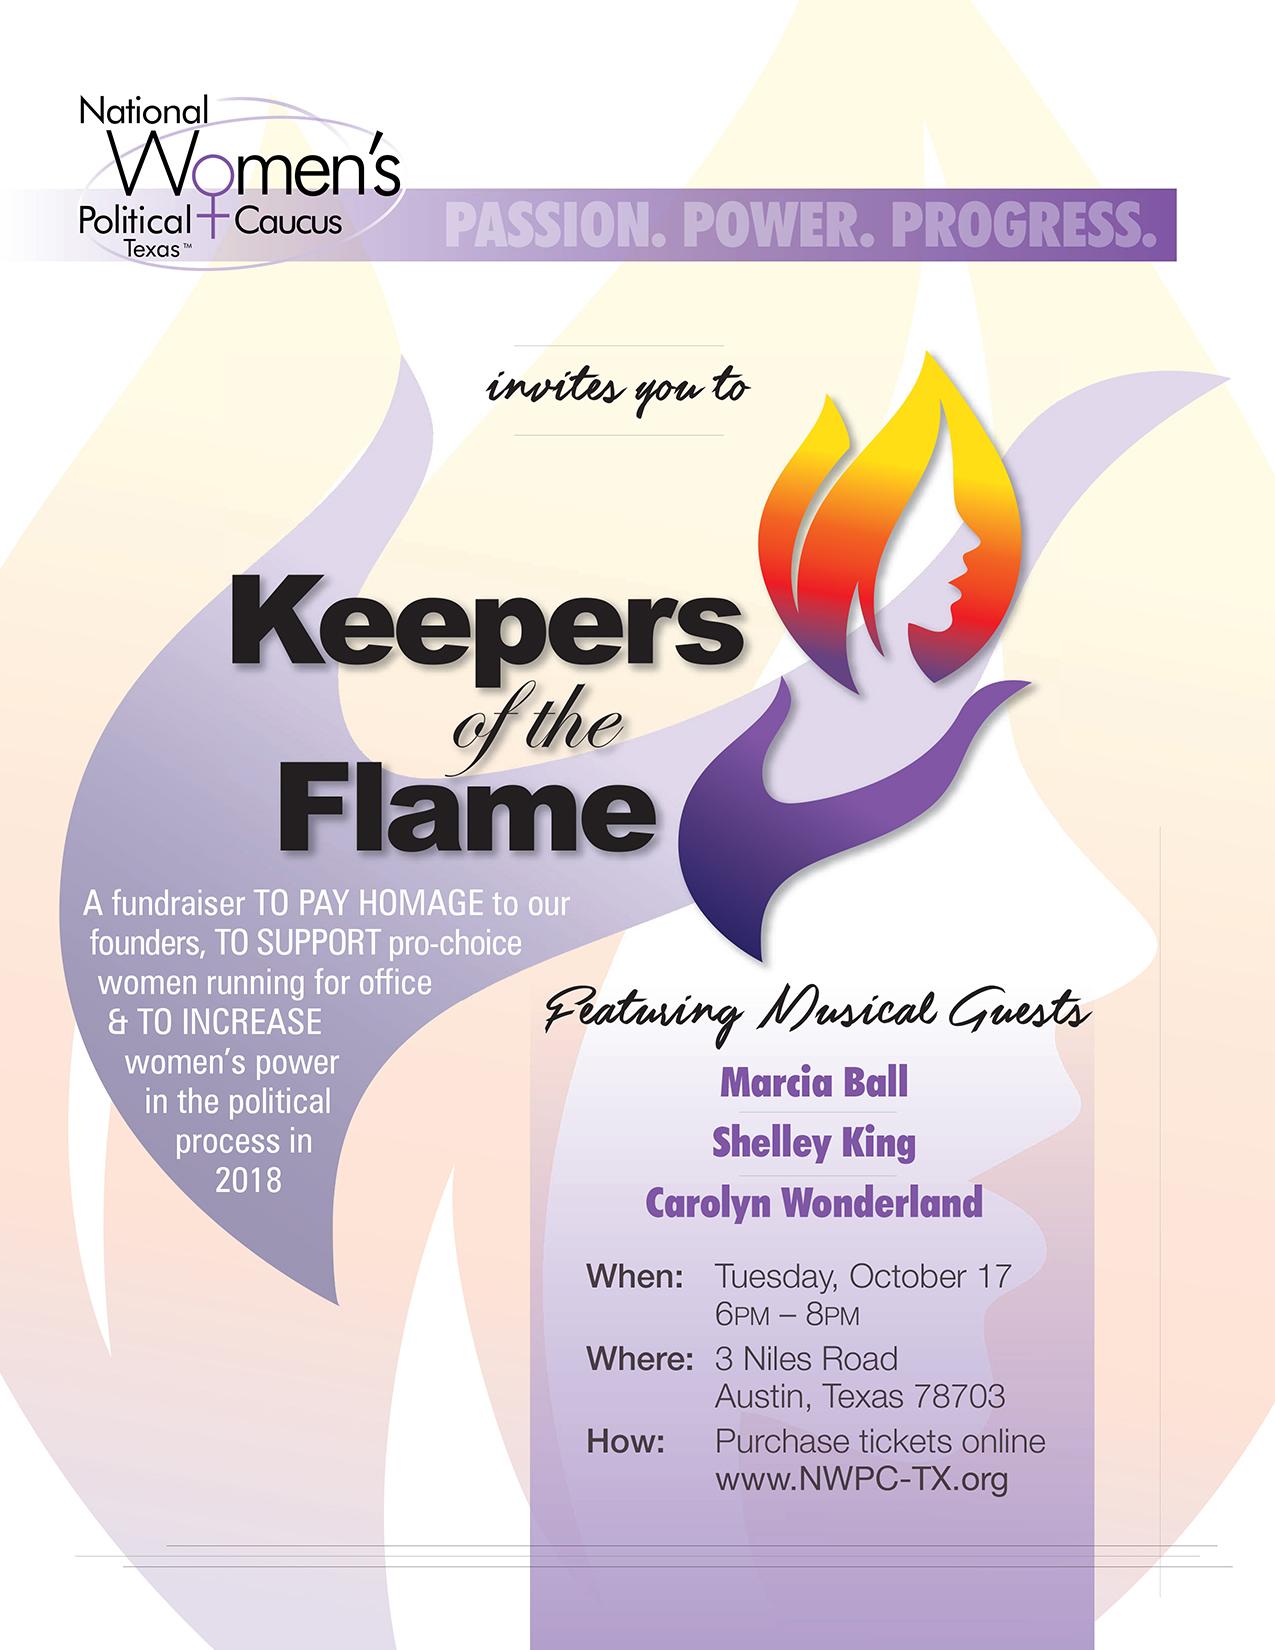 NWPC_KOTF-Fundraiser_InvitationWeb.jpg